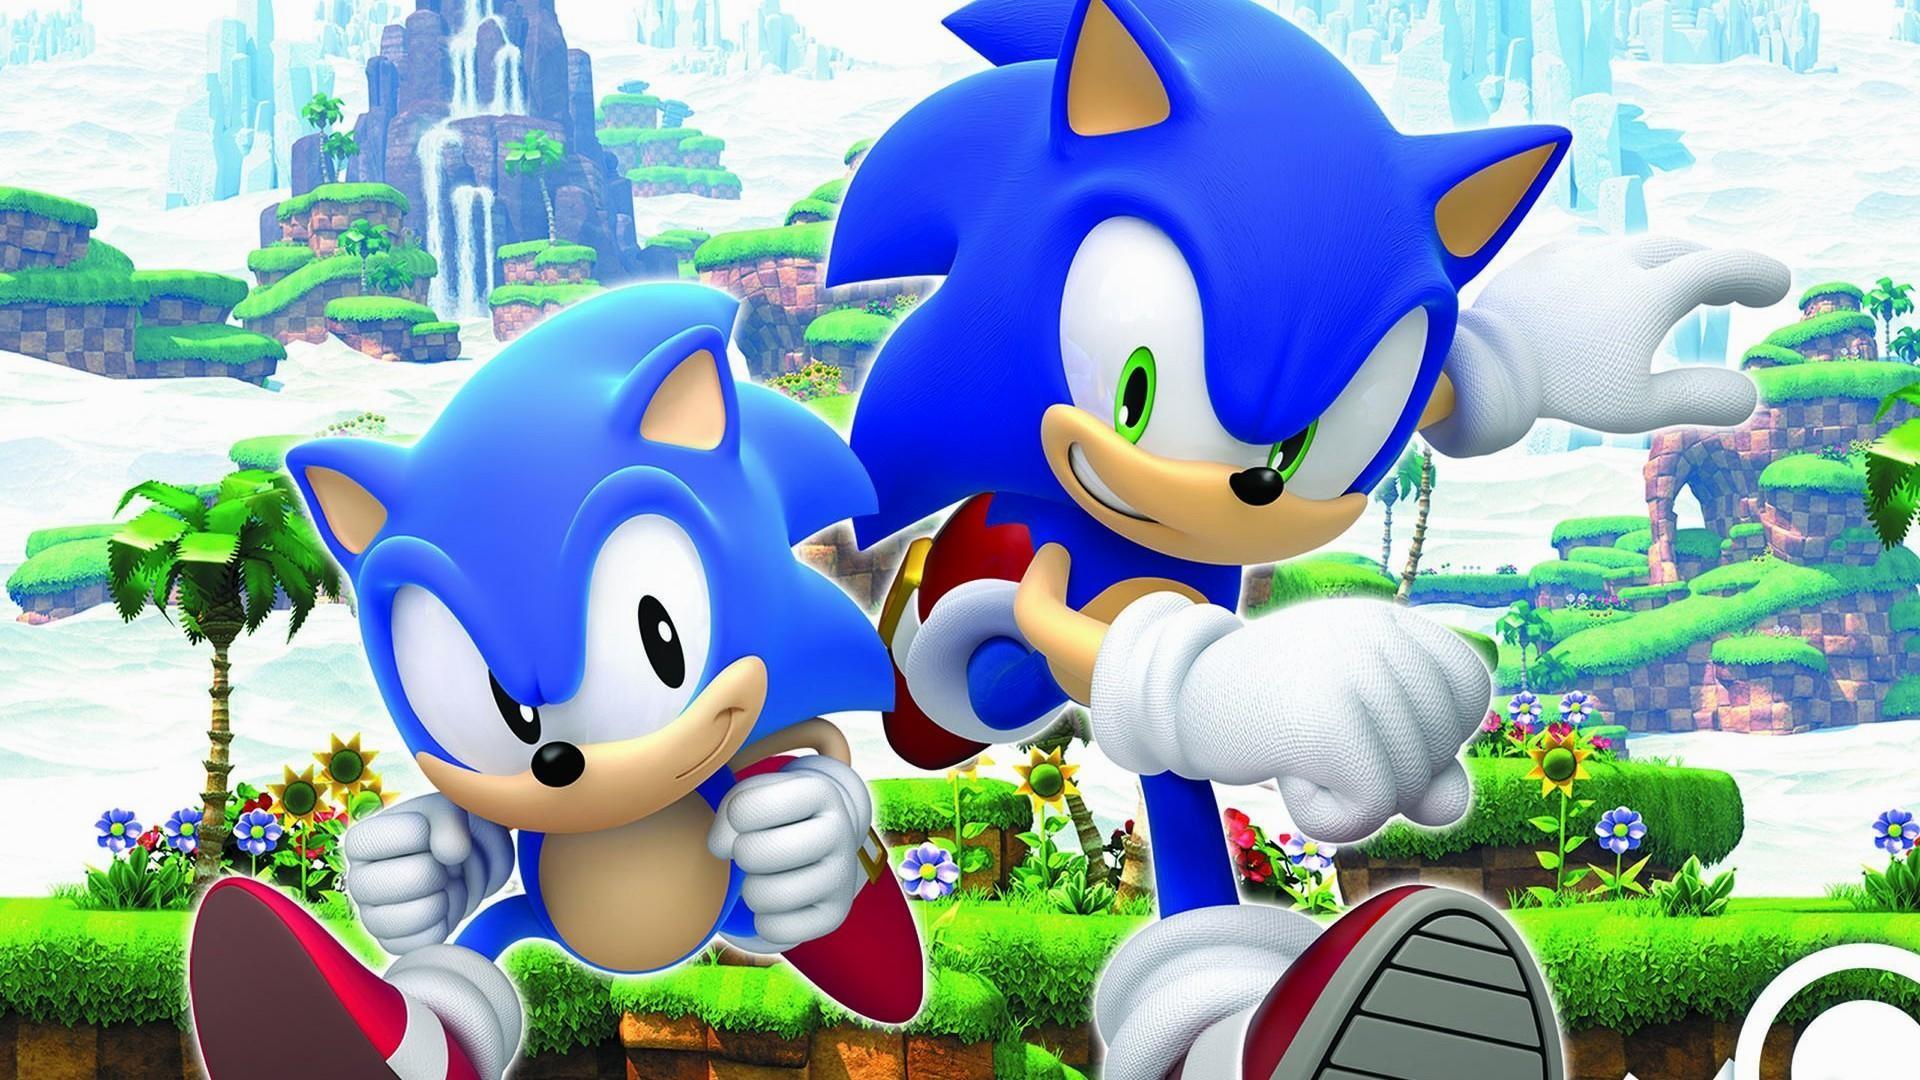 Sonic-Sonic-the-Hedgehog-sonic-generations